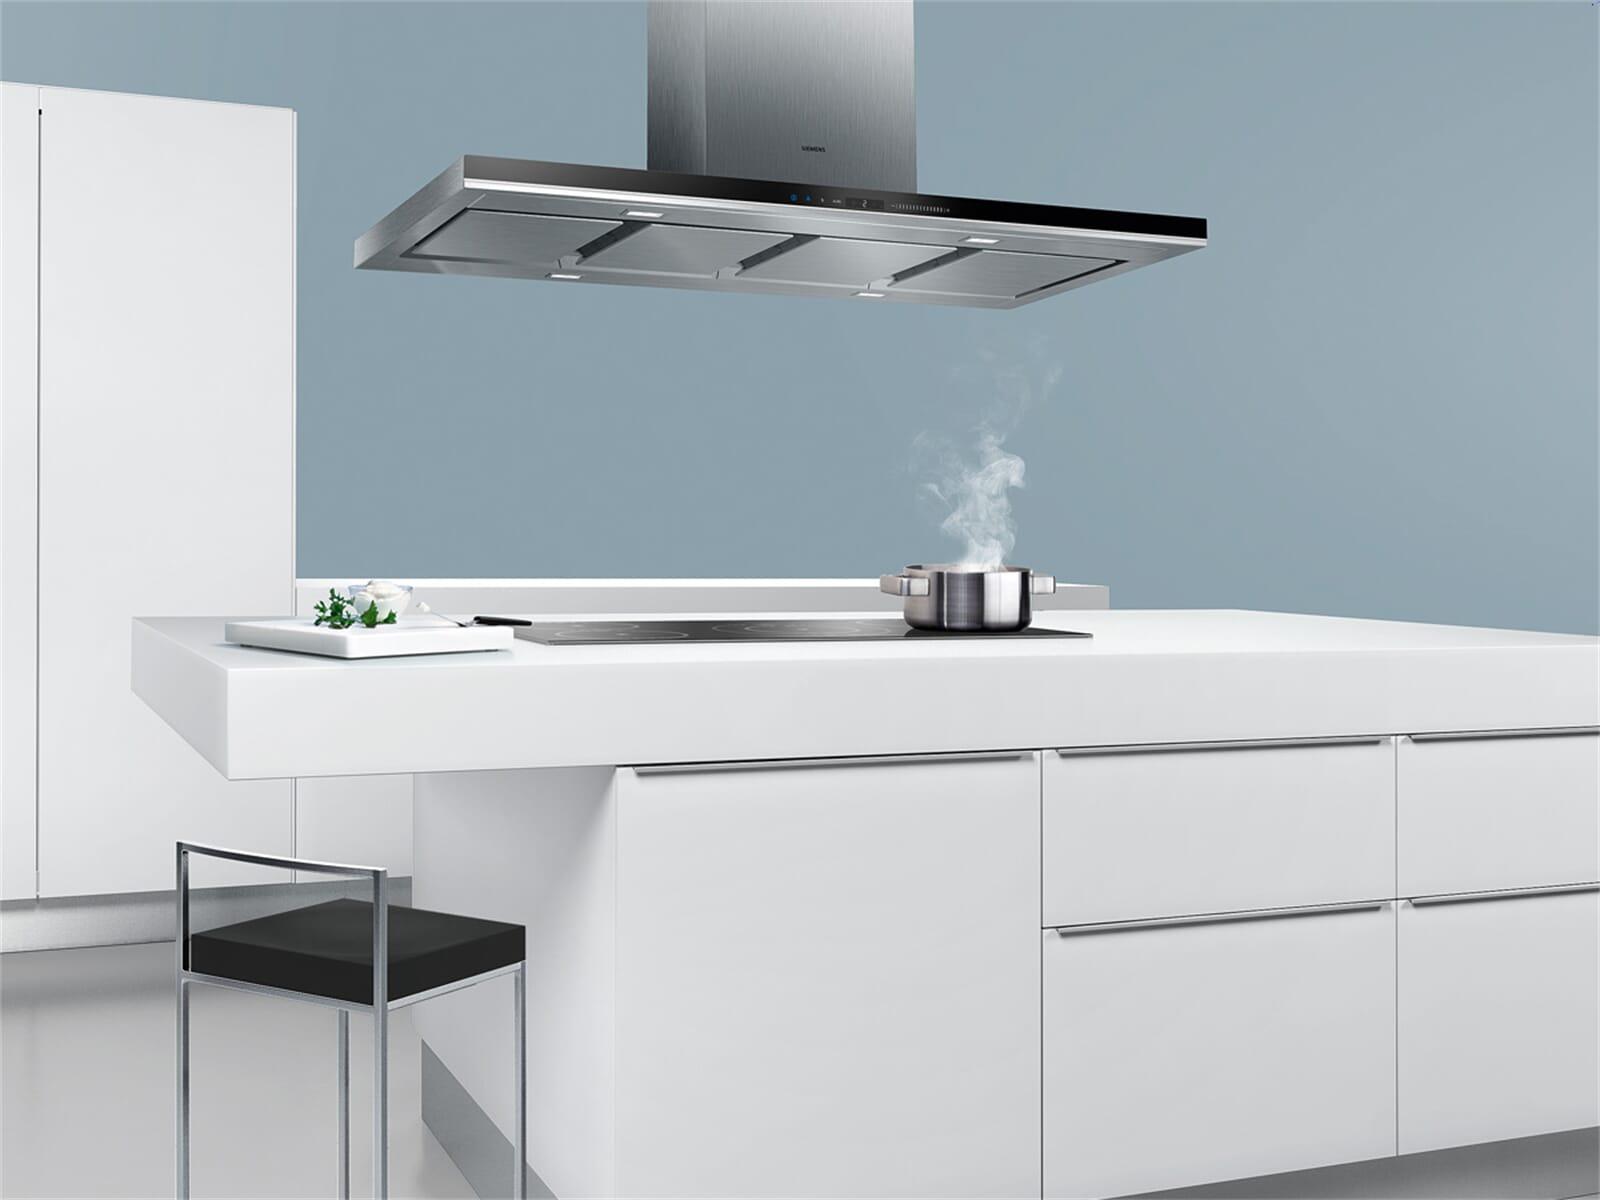 siemens lf21ba582 inselhaube edelstahl. Black Bedroom Furniture Sets. Home Design Ideas